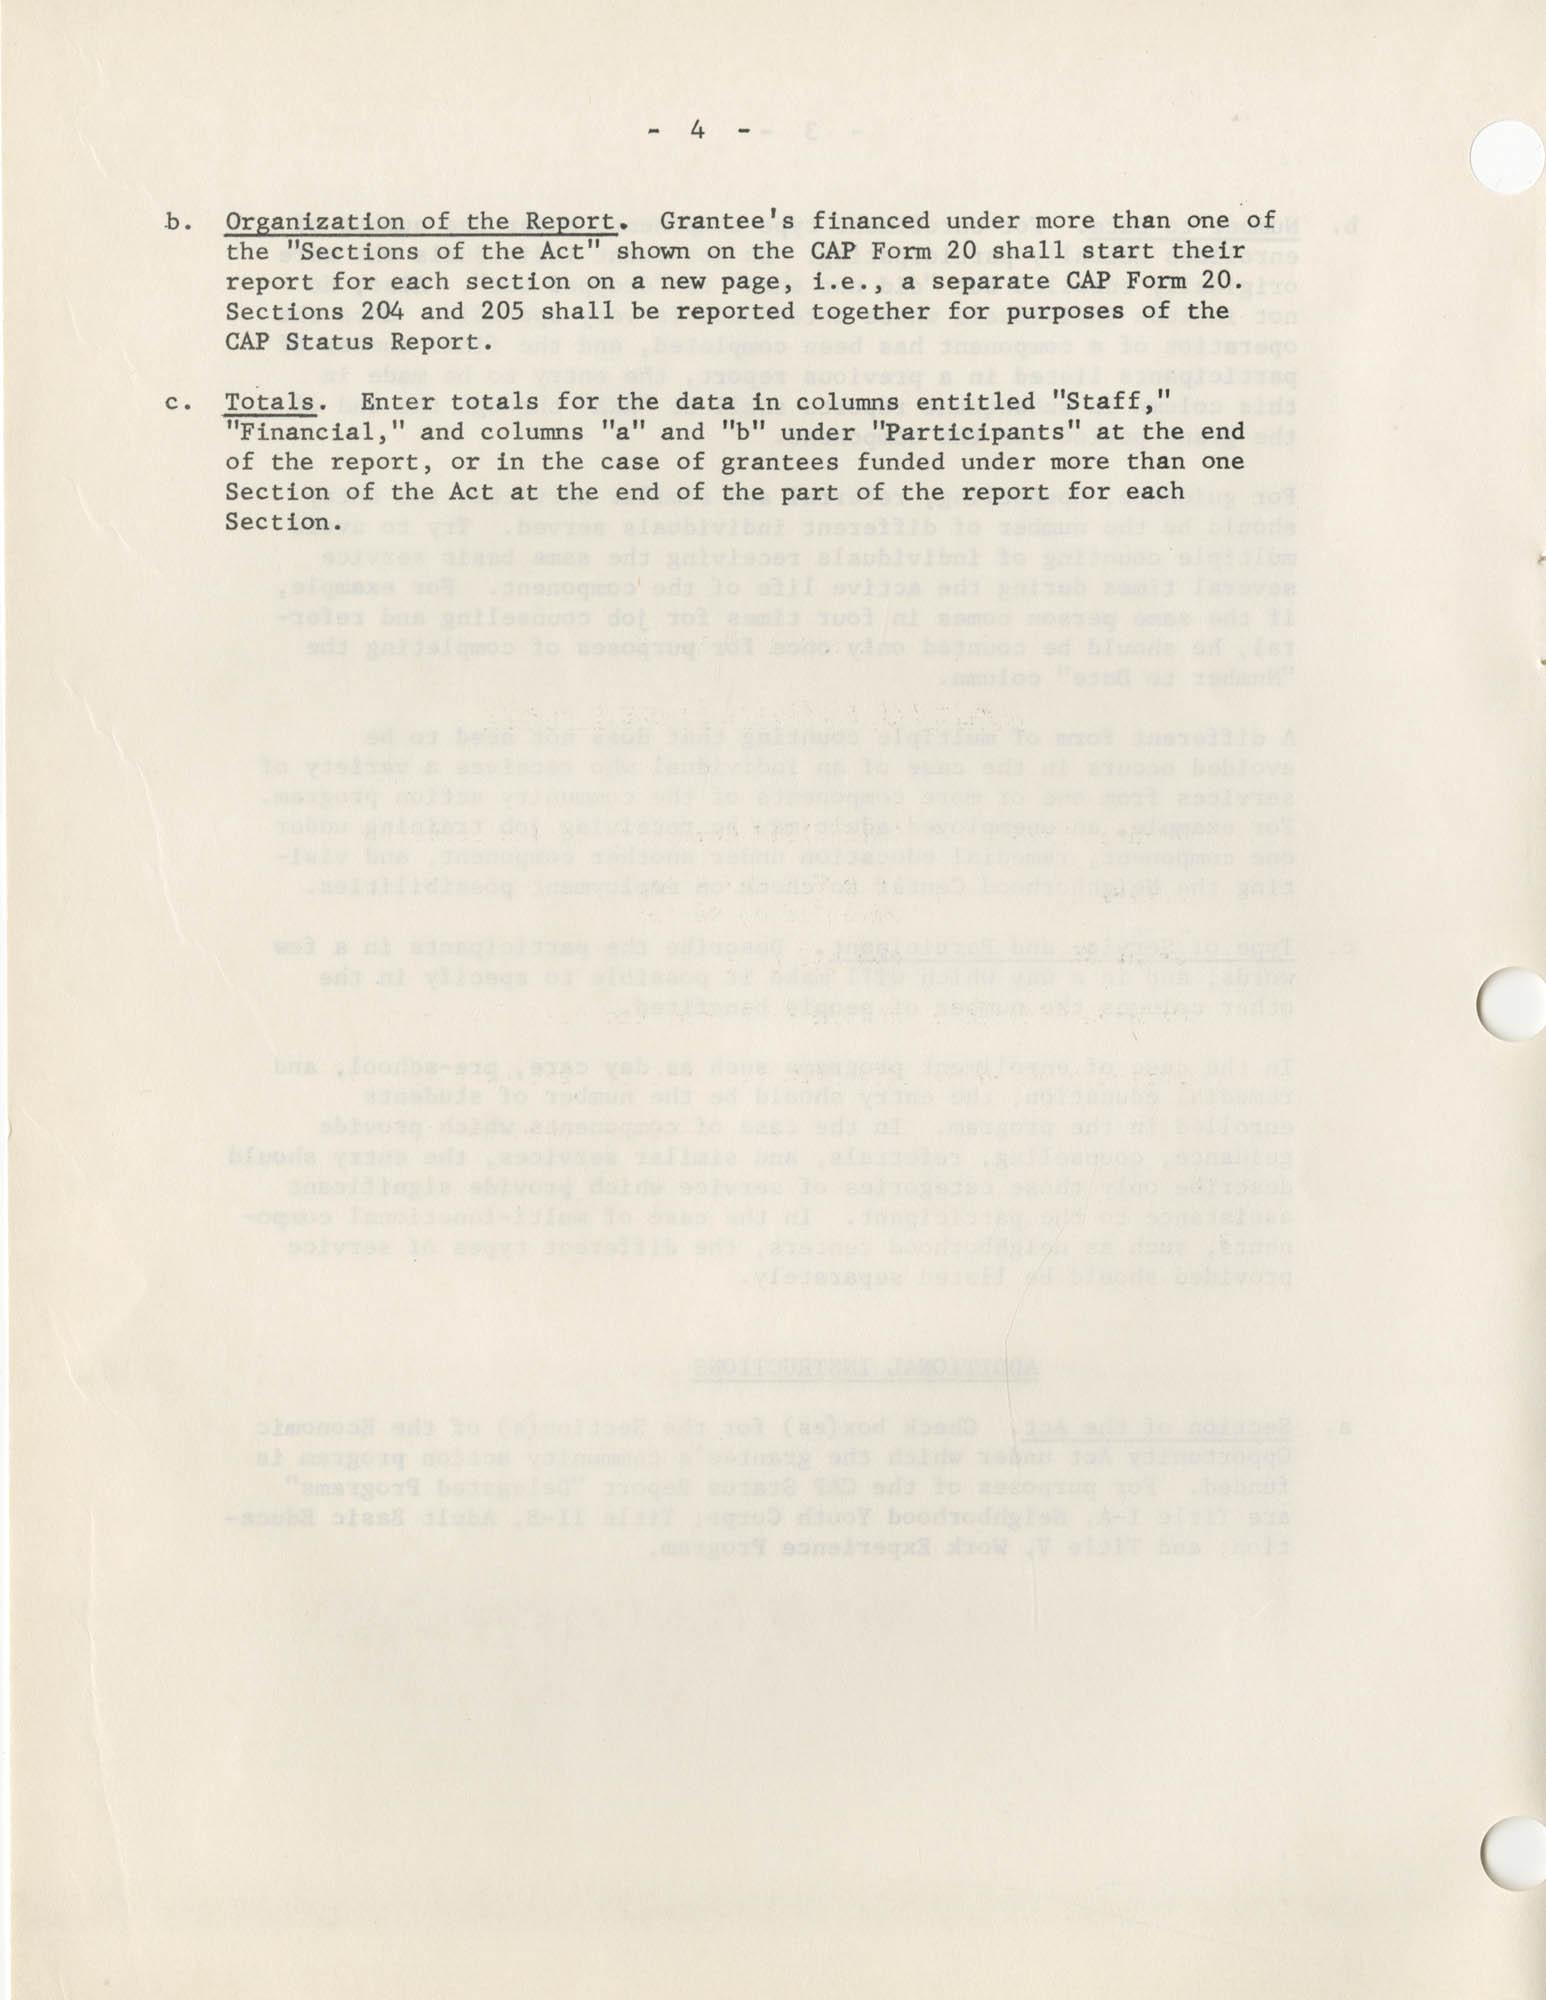 Community Action Program Memorandum No. 8, Attachment No. 1, Page 4